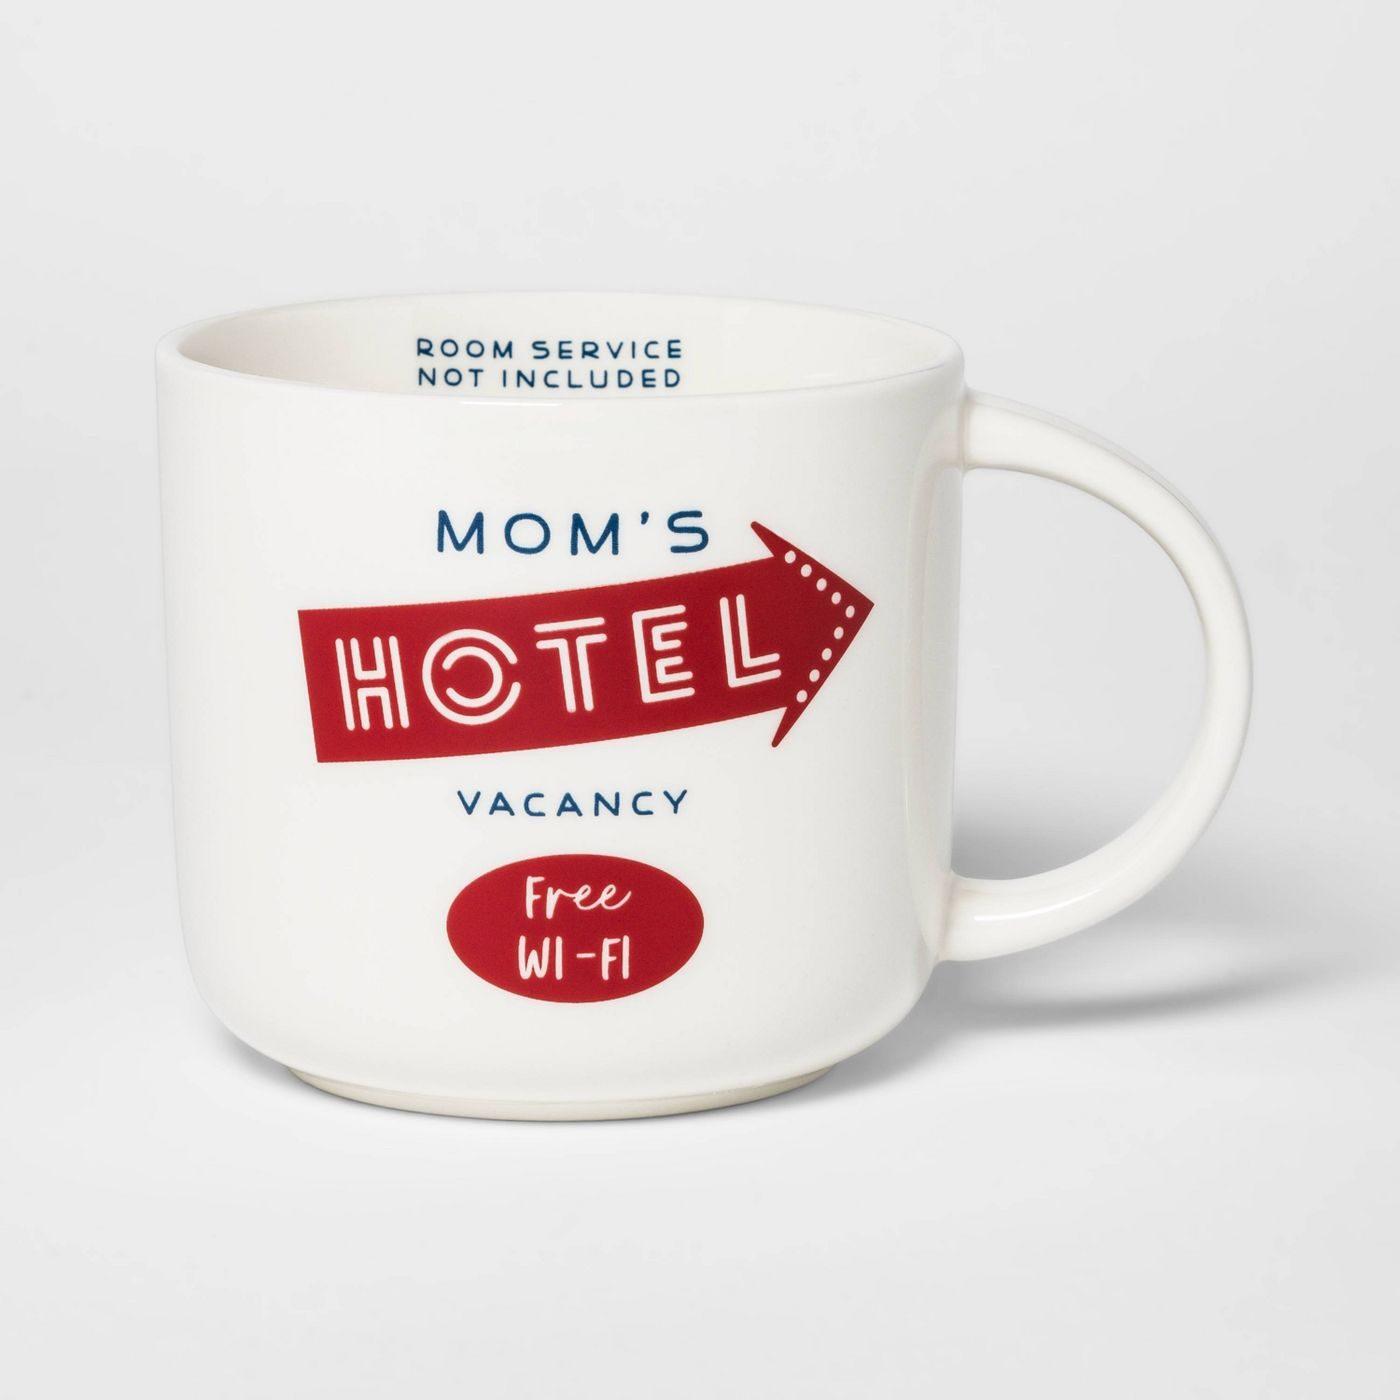 moms hotel mug